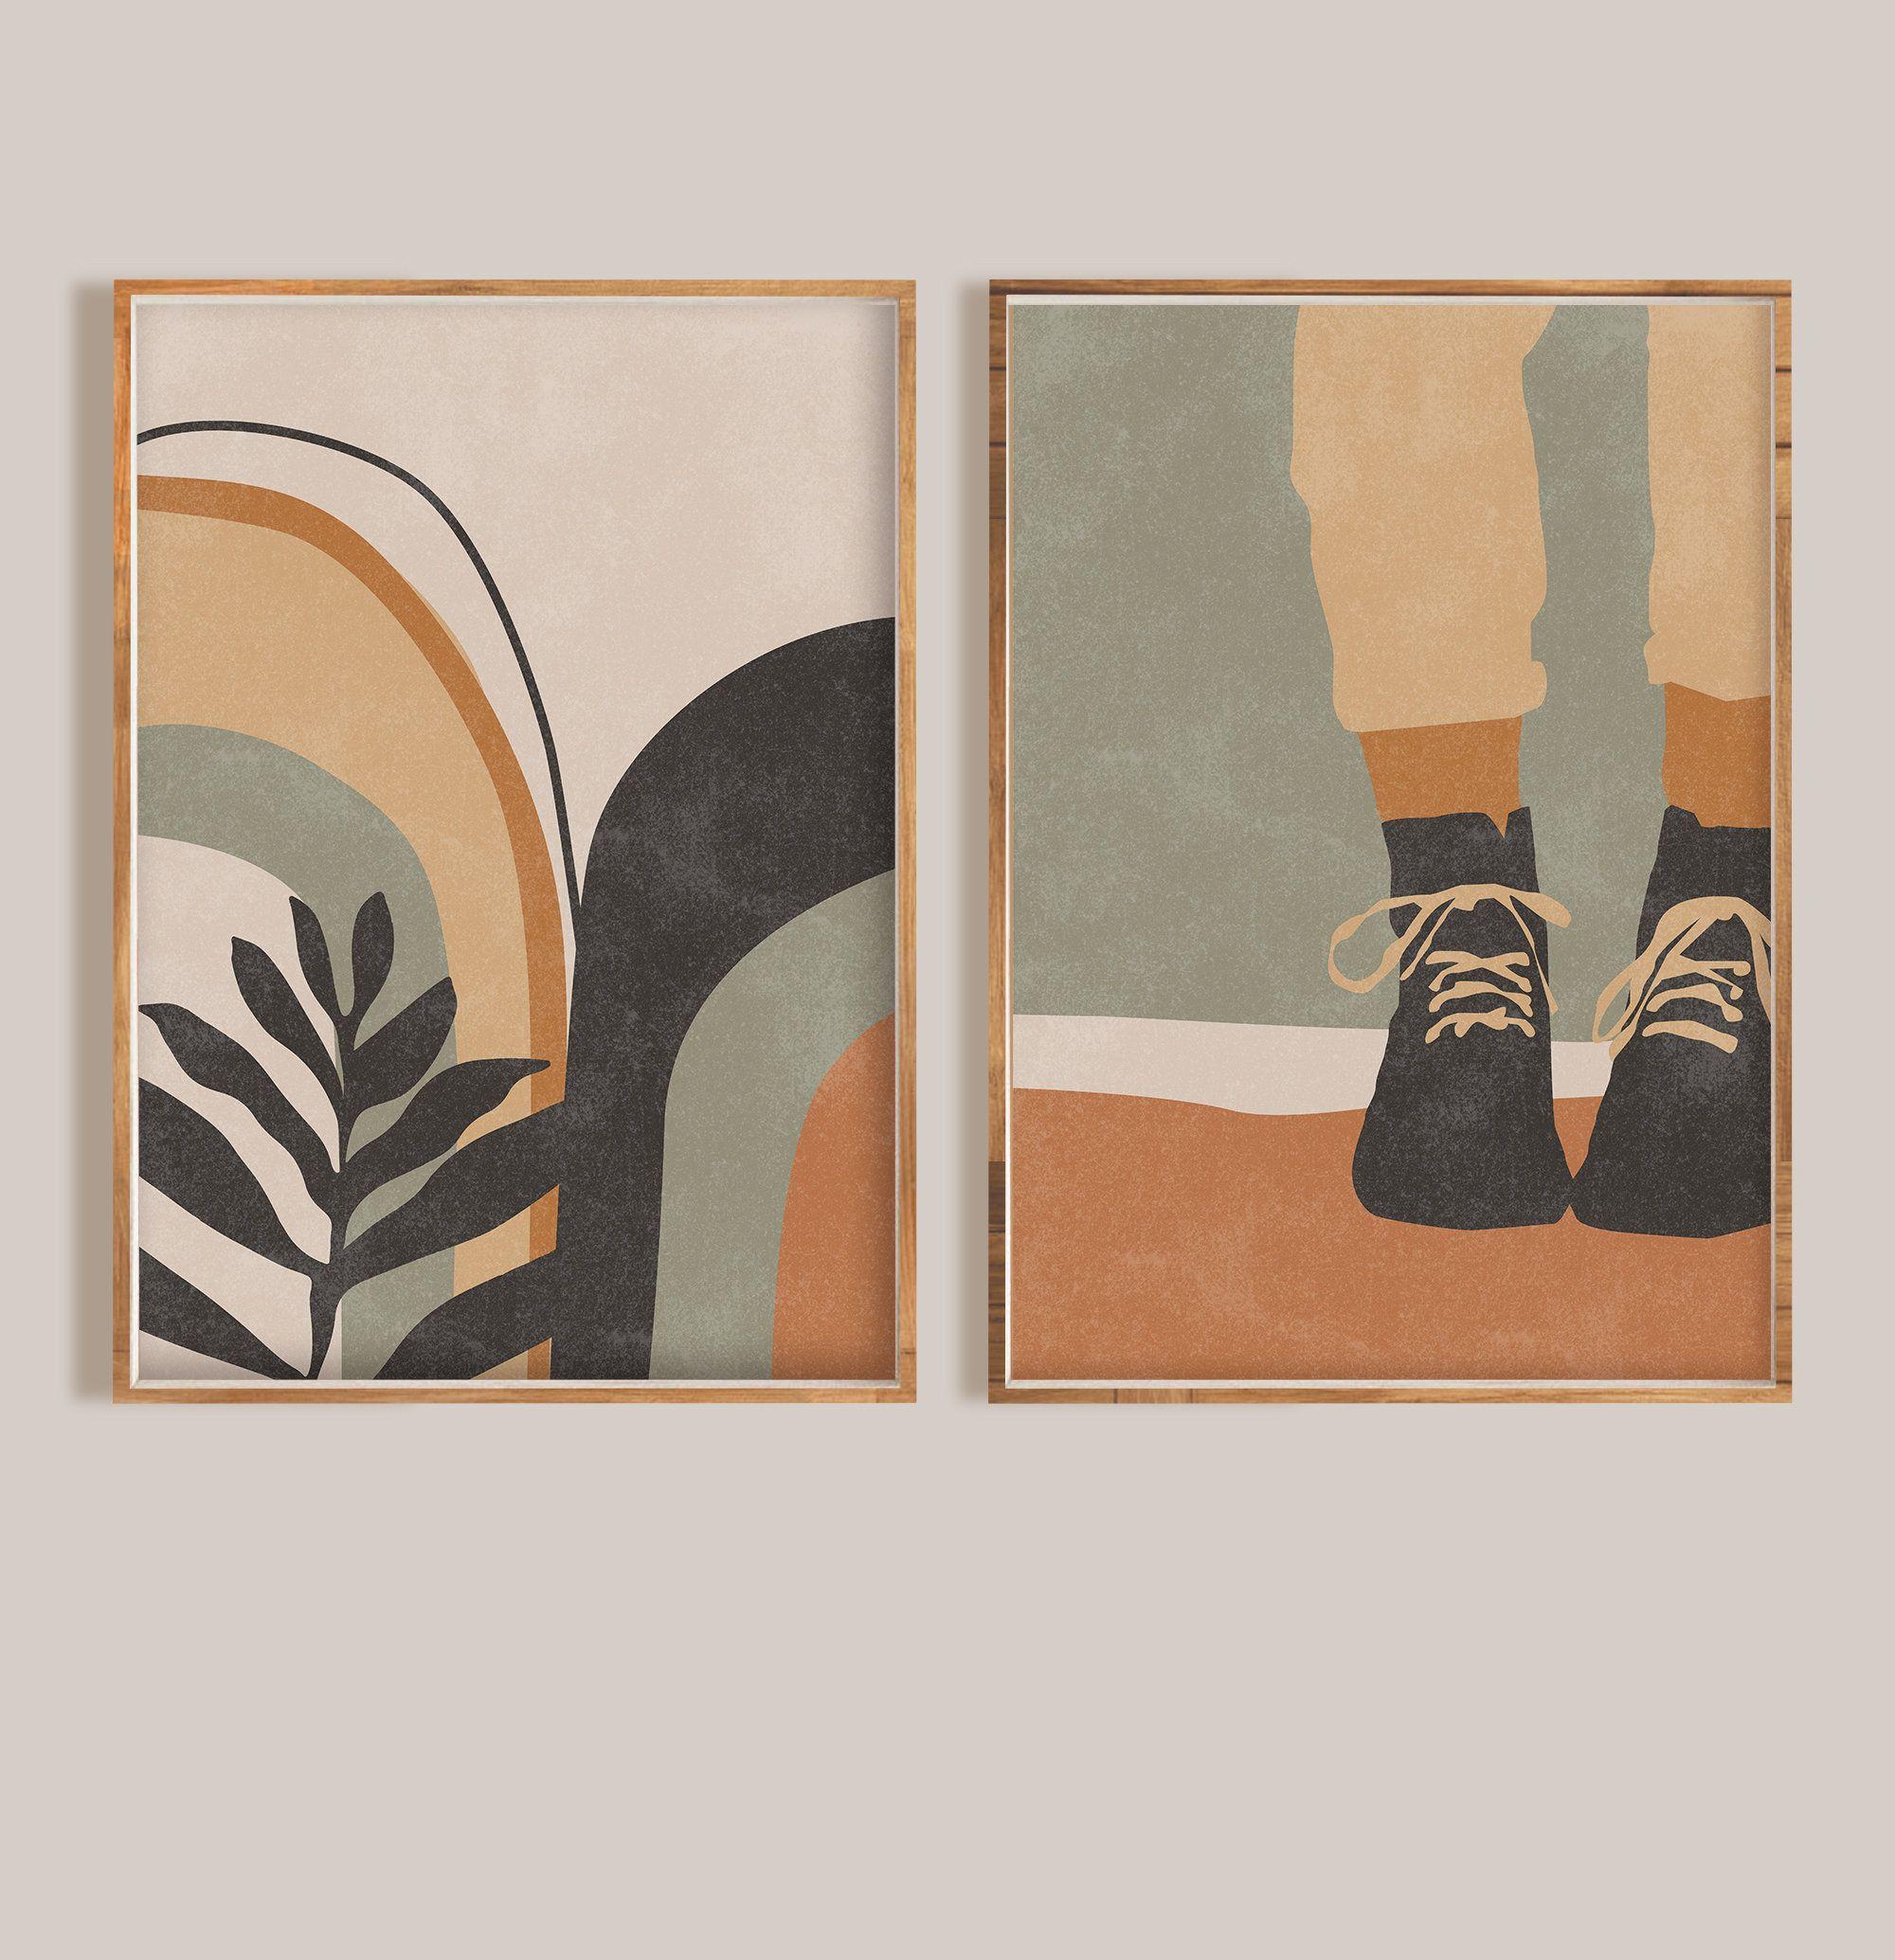 Mid Century Modern Art Print Set Of 2 Minimal Abstract Wall Art Botanical Poster Boho Home Decor Neutral Art Printable Digital Download In 2020 Mid Century Modern Art Print Modern Art